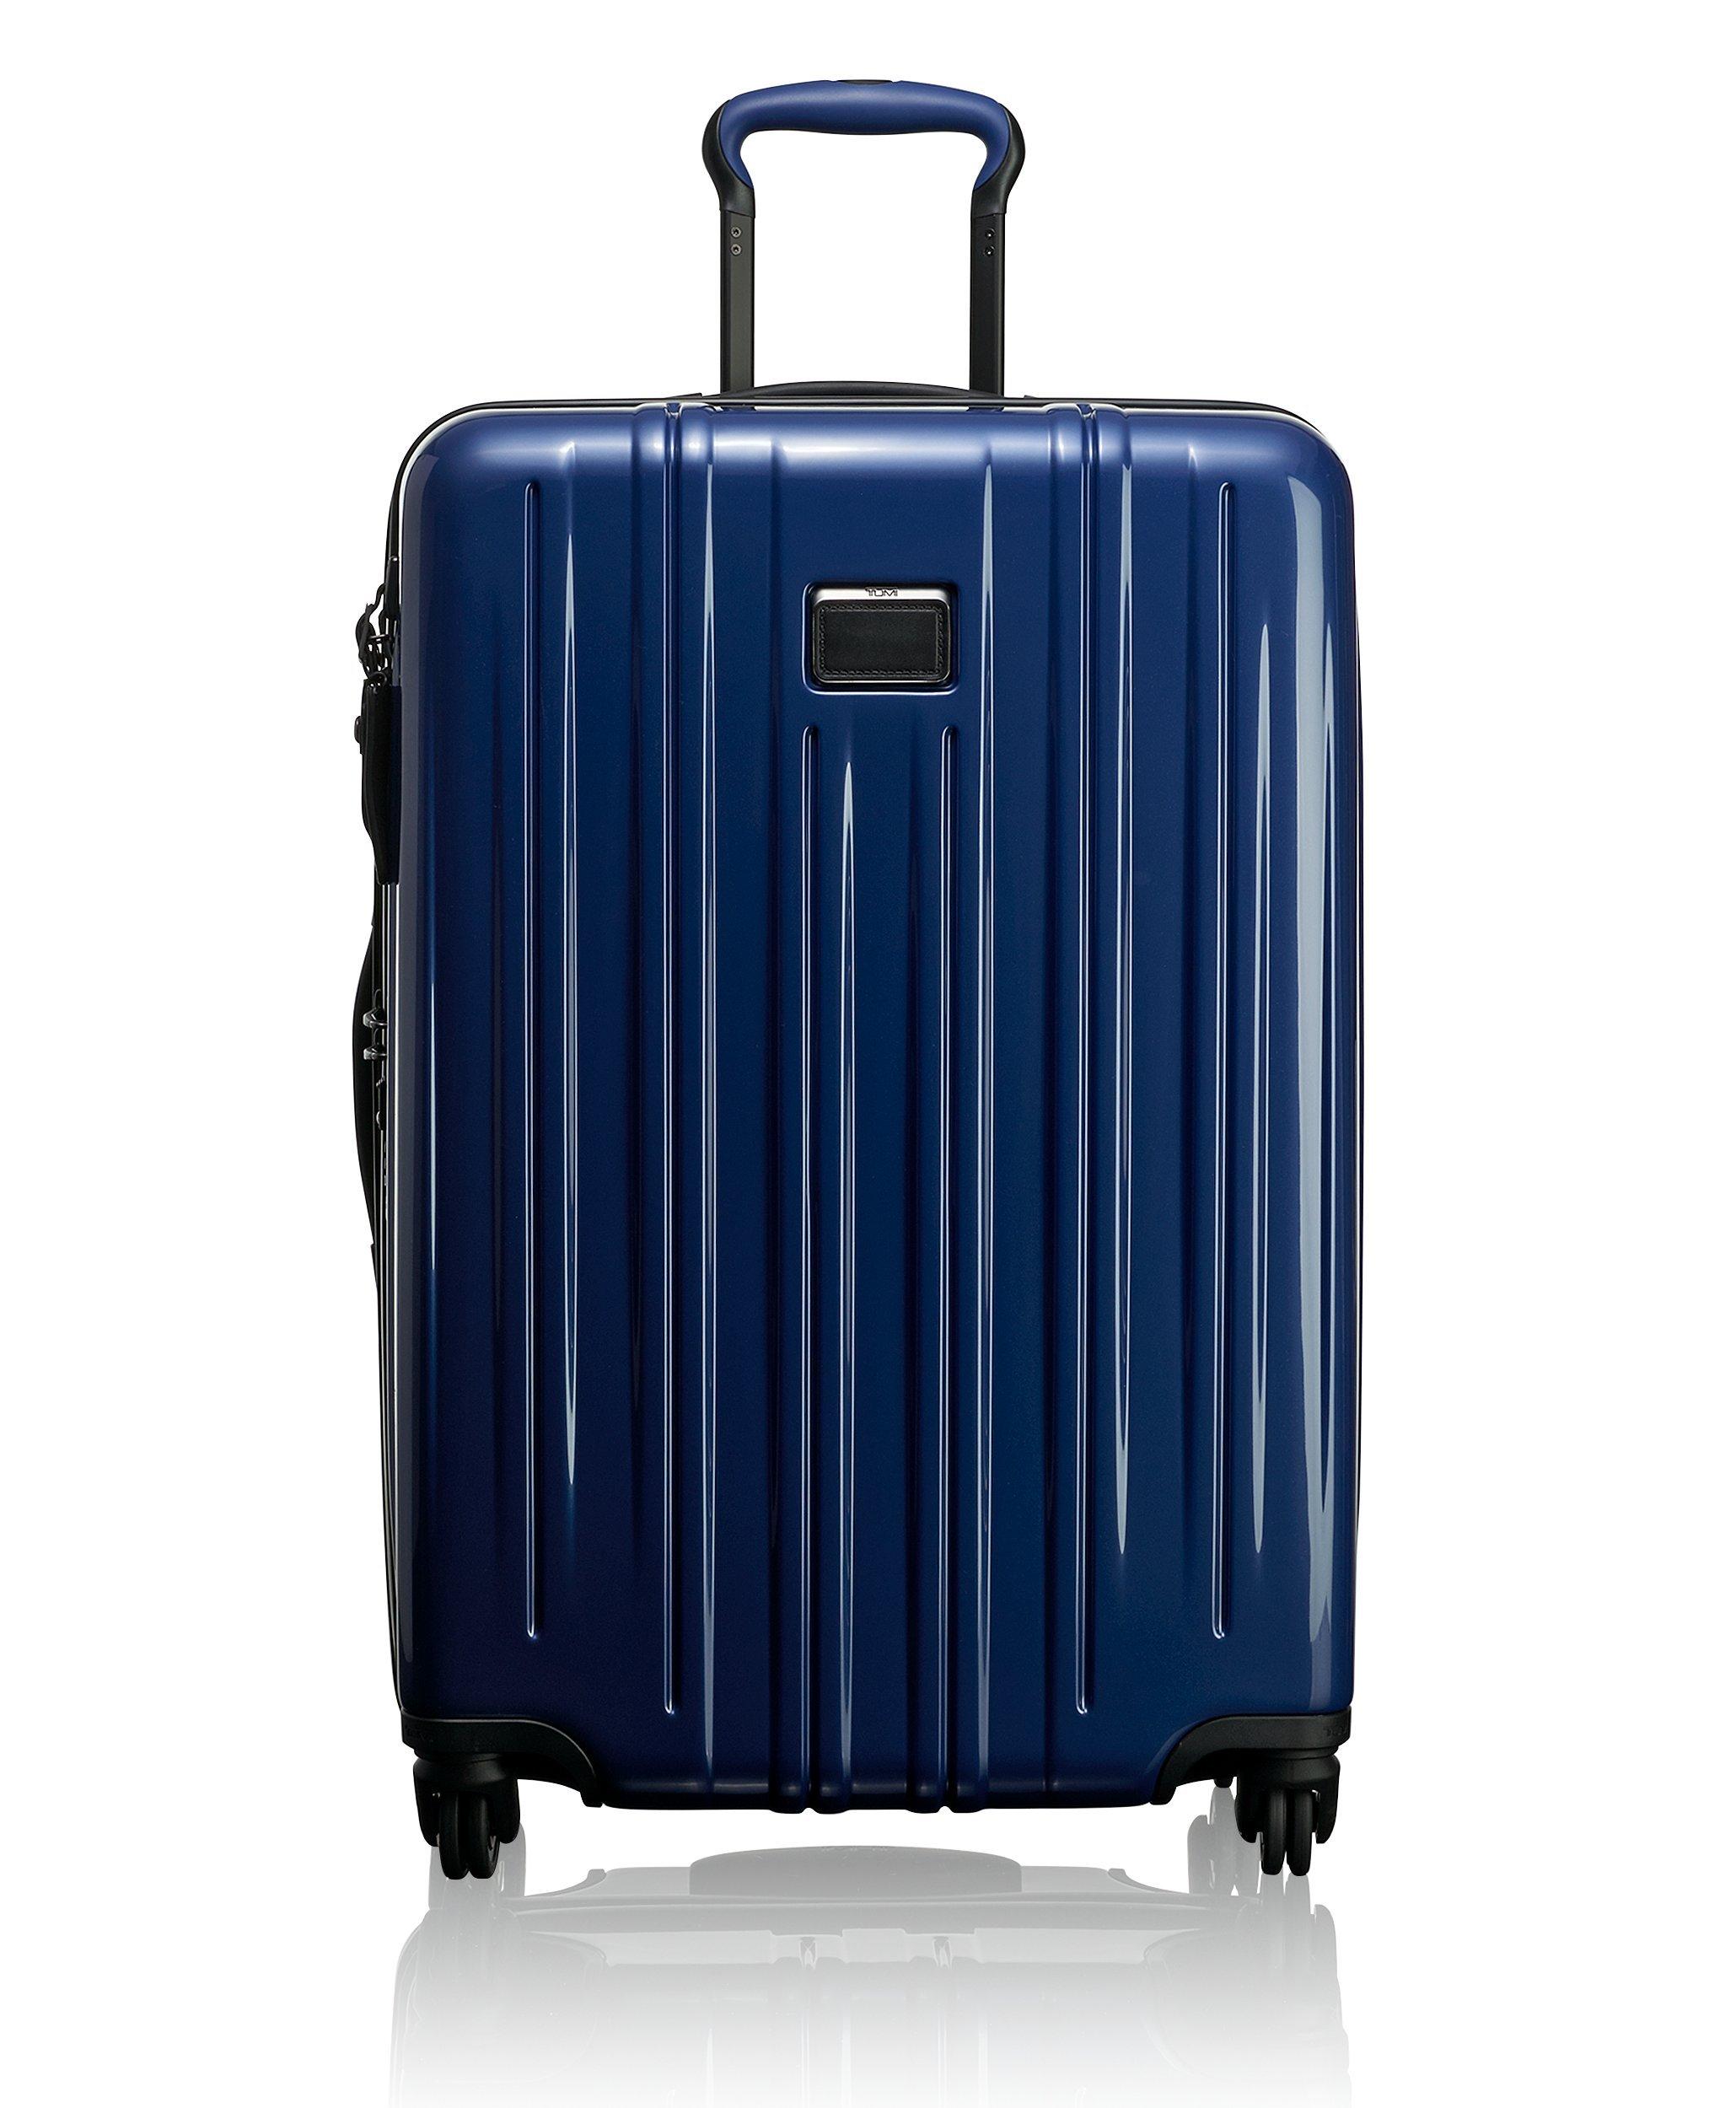 Tumi V3 Short Trip Expandable Packing Case, Pacific Blue